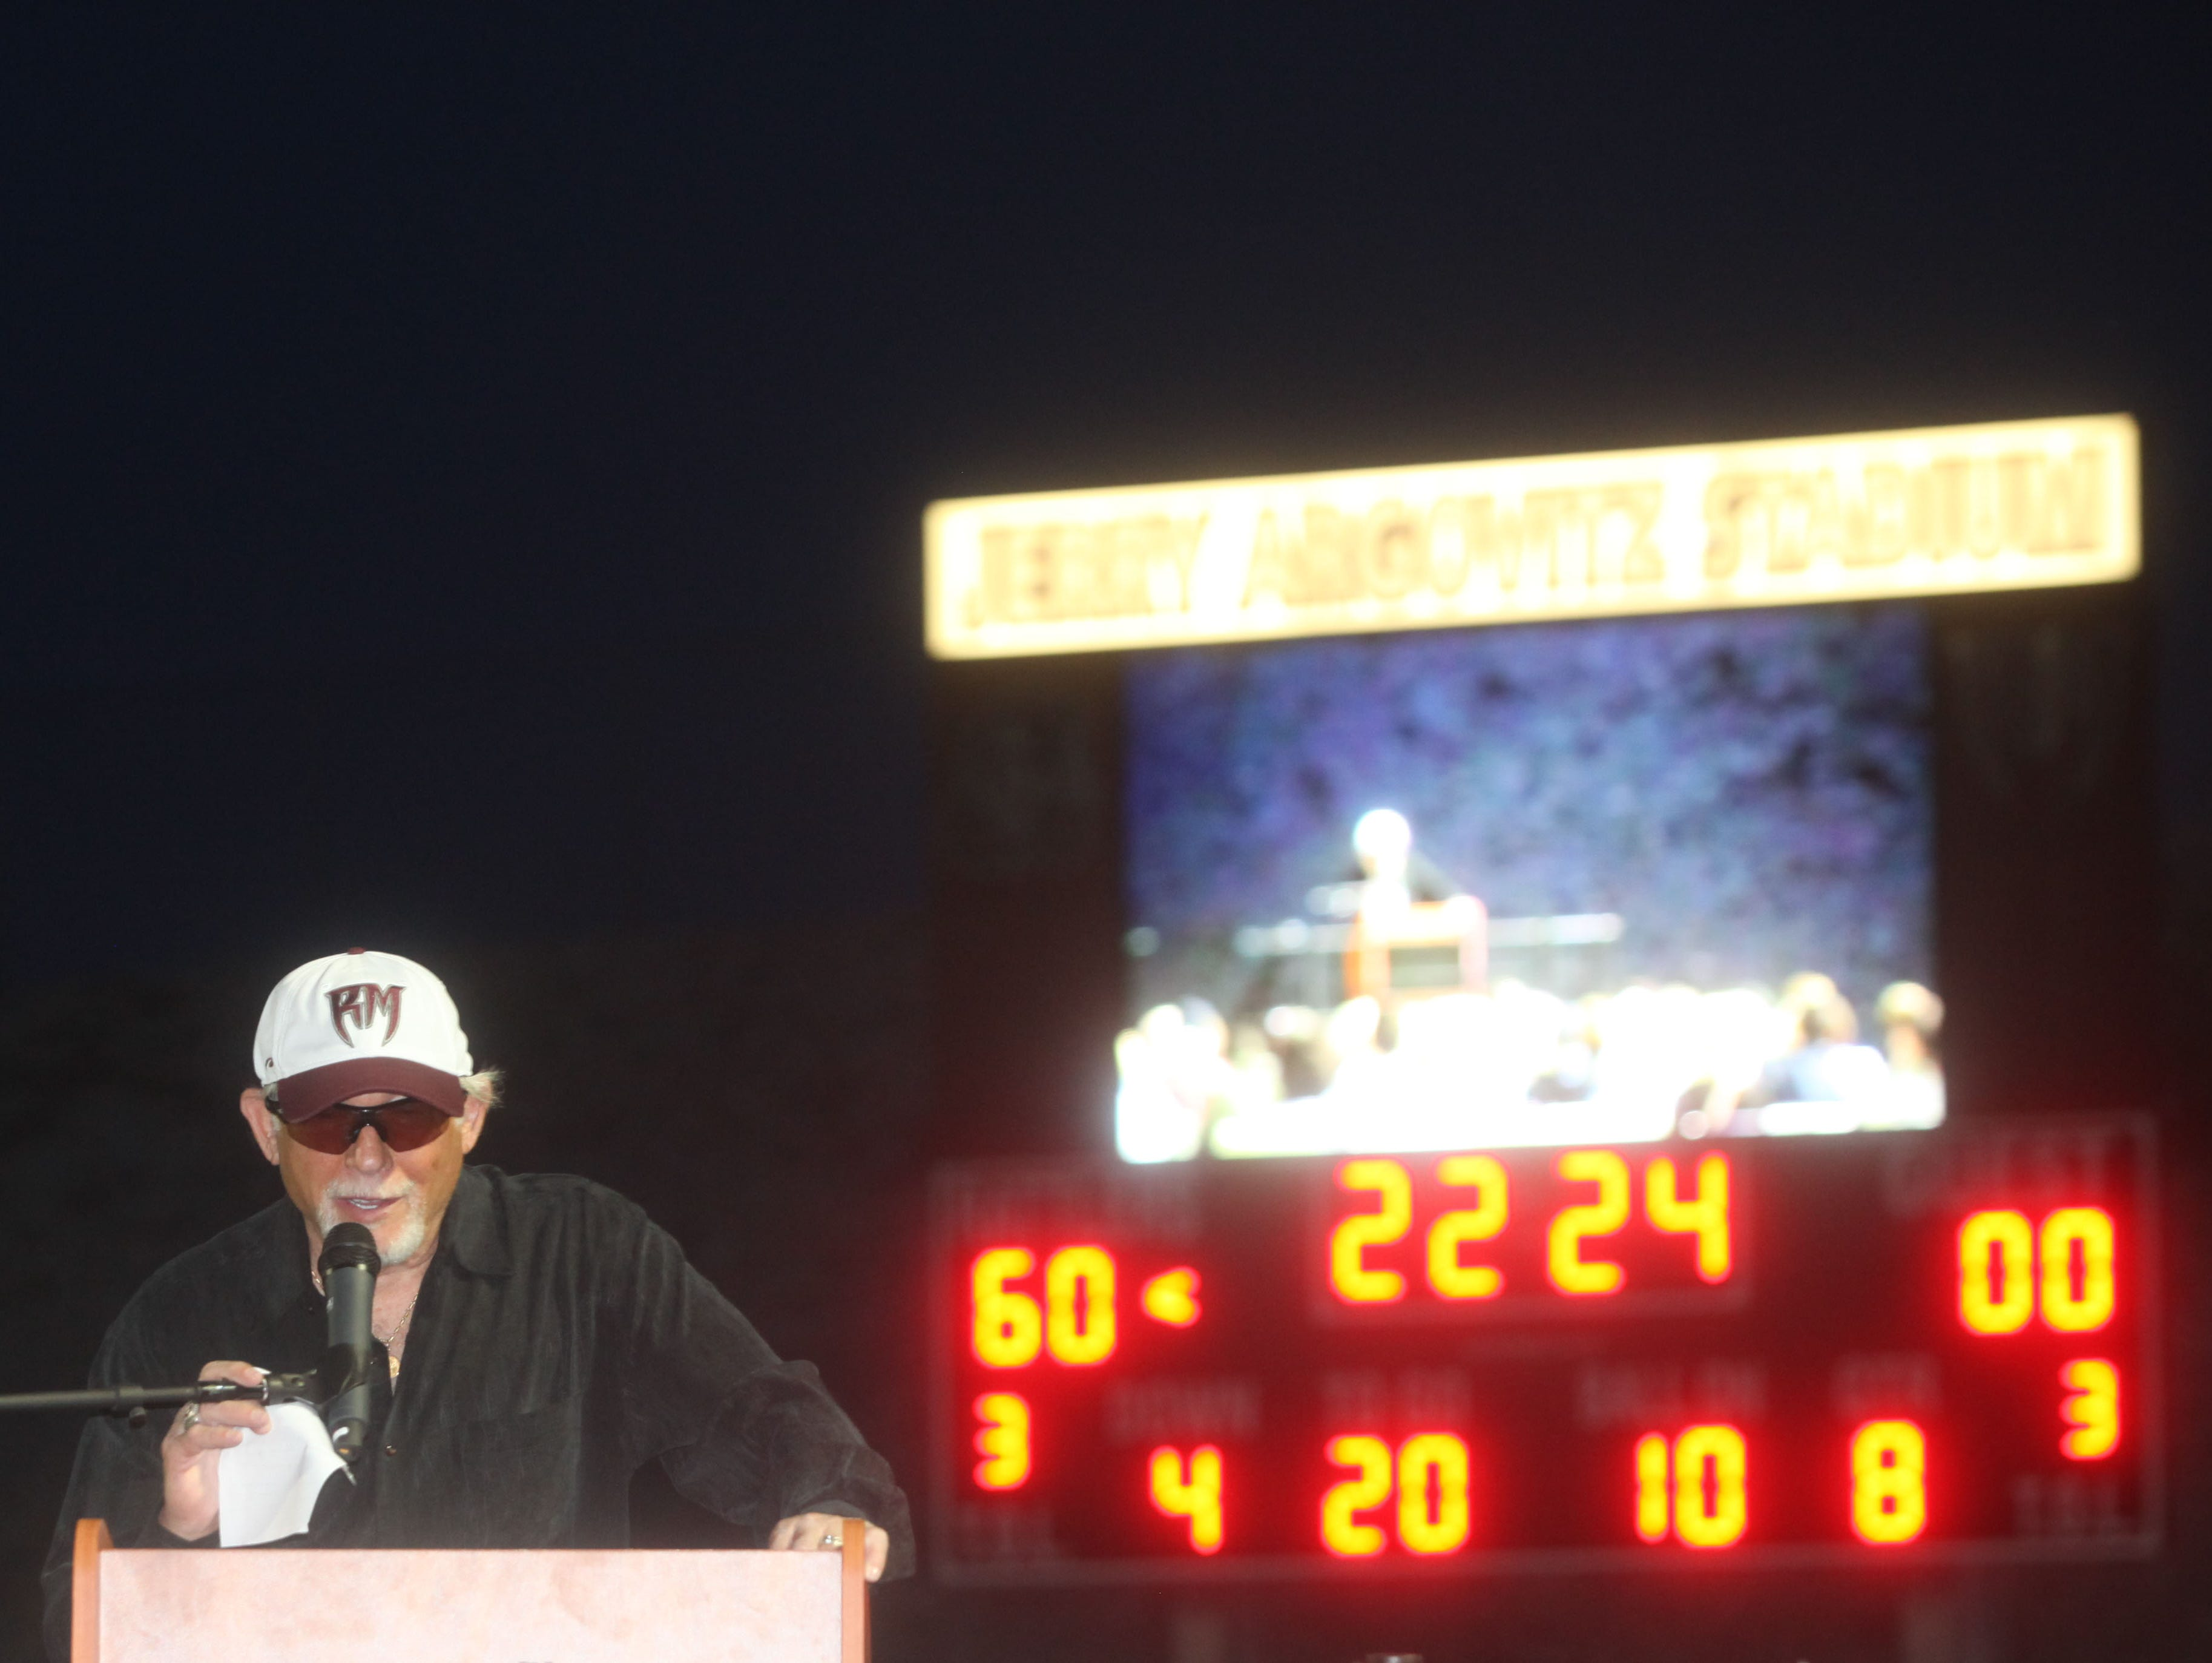 Jerry Argovitz speaks during the presentation of the a jumbotron at Jerry Argovitz Stadium at Ranch Mirage High School.